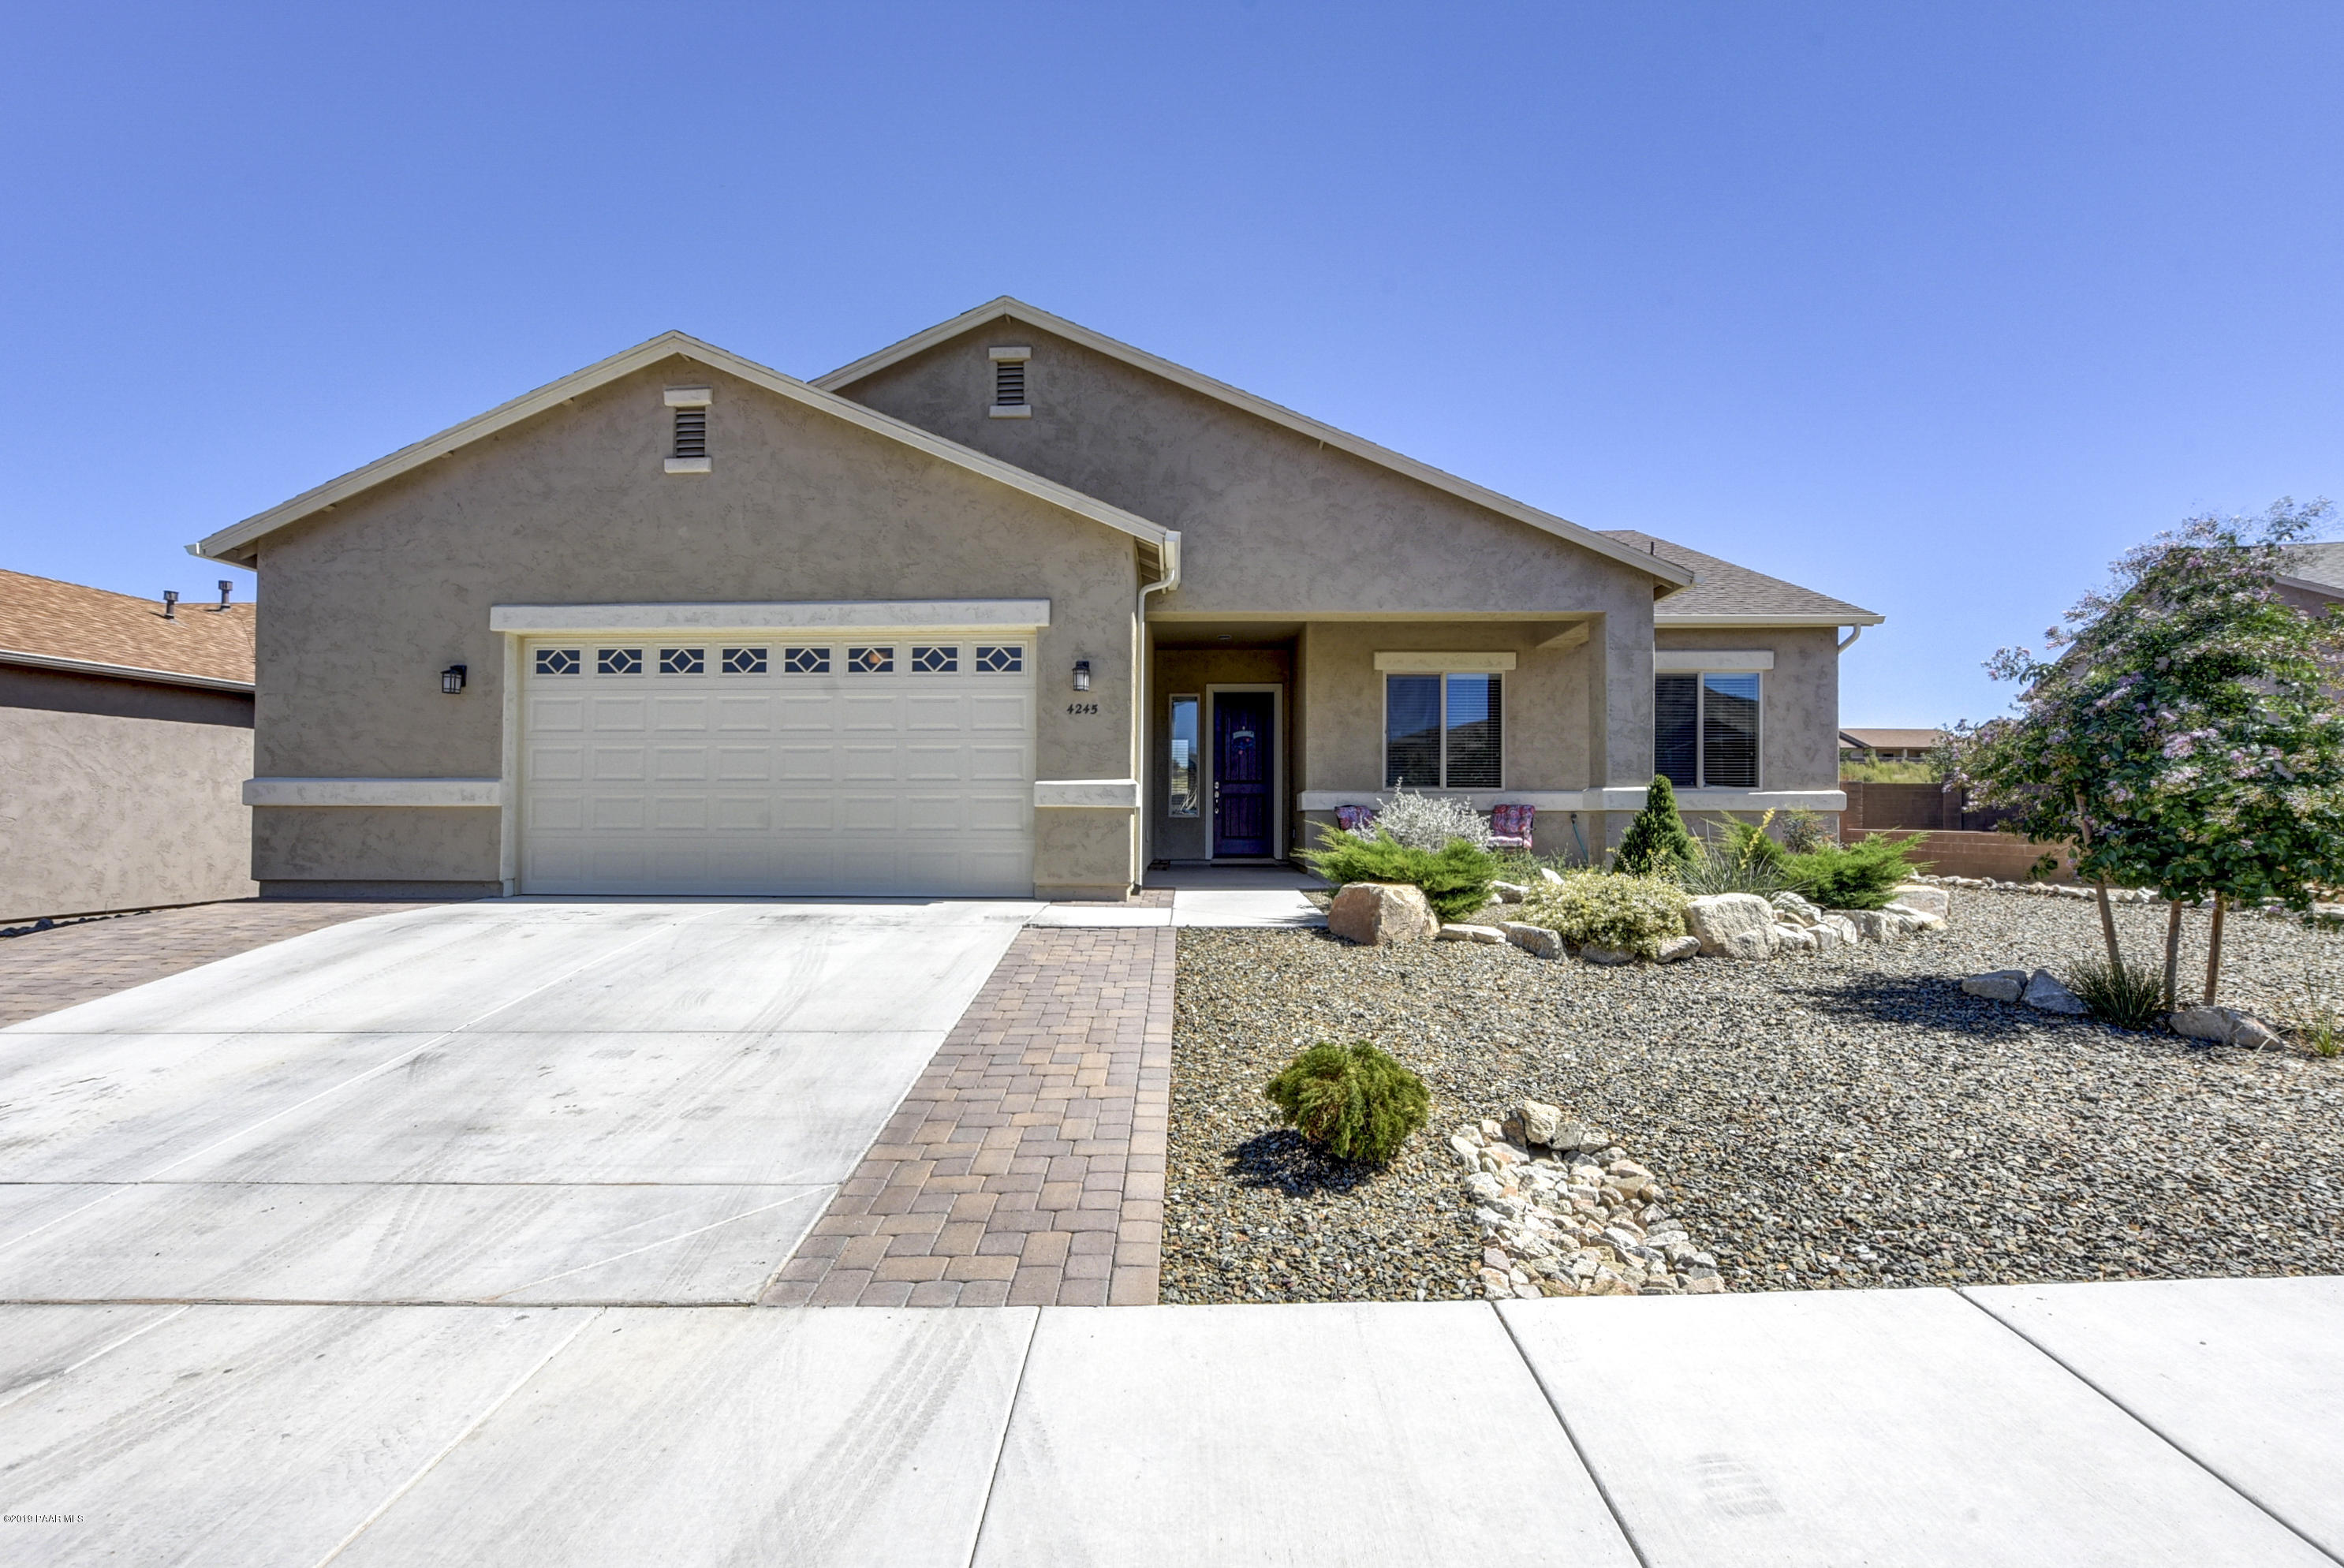 Photo of 4245 Cambridge, Prescott Valley, AZ 86314